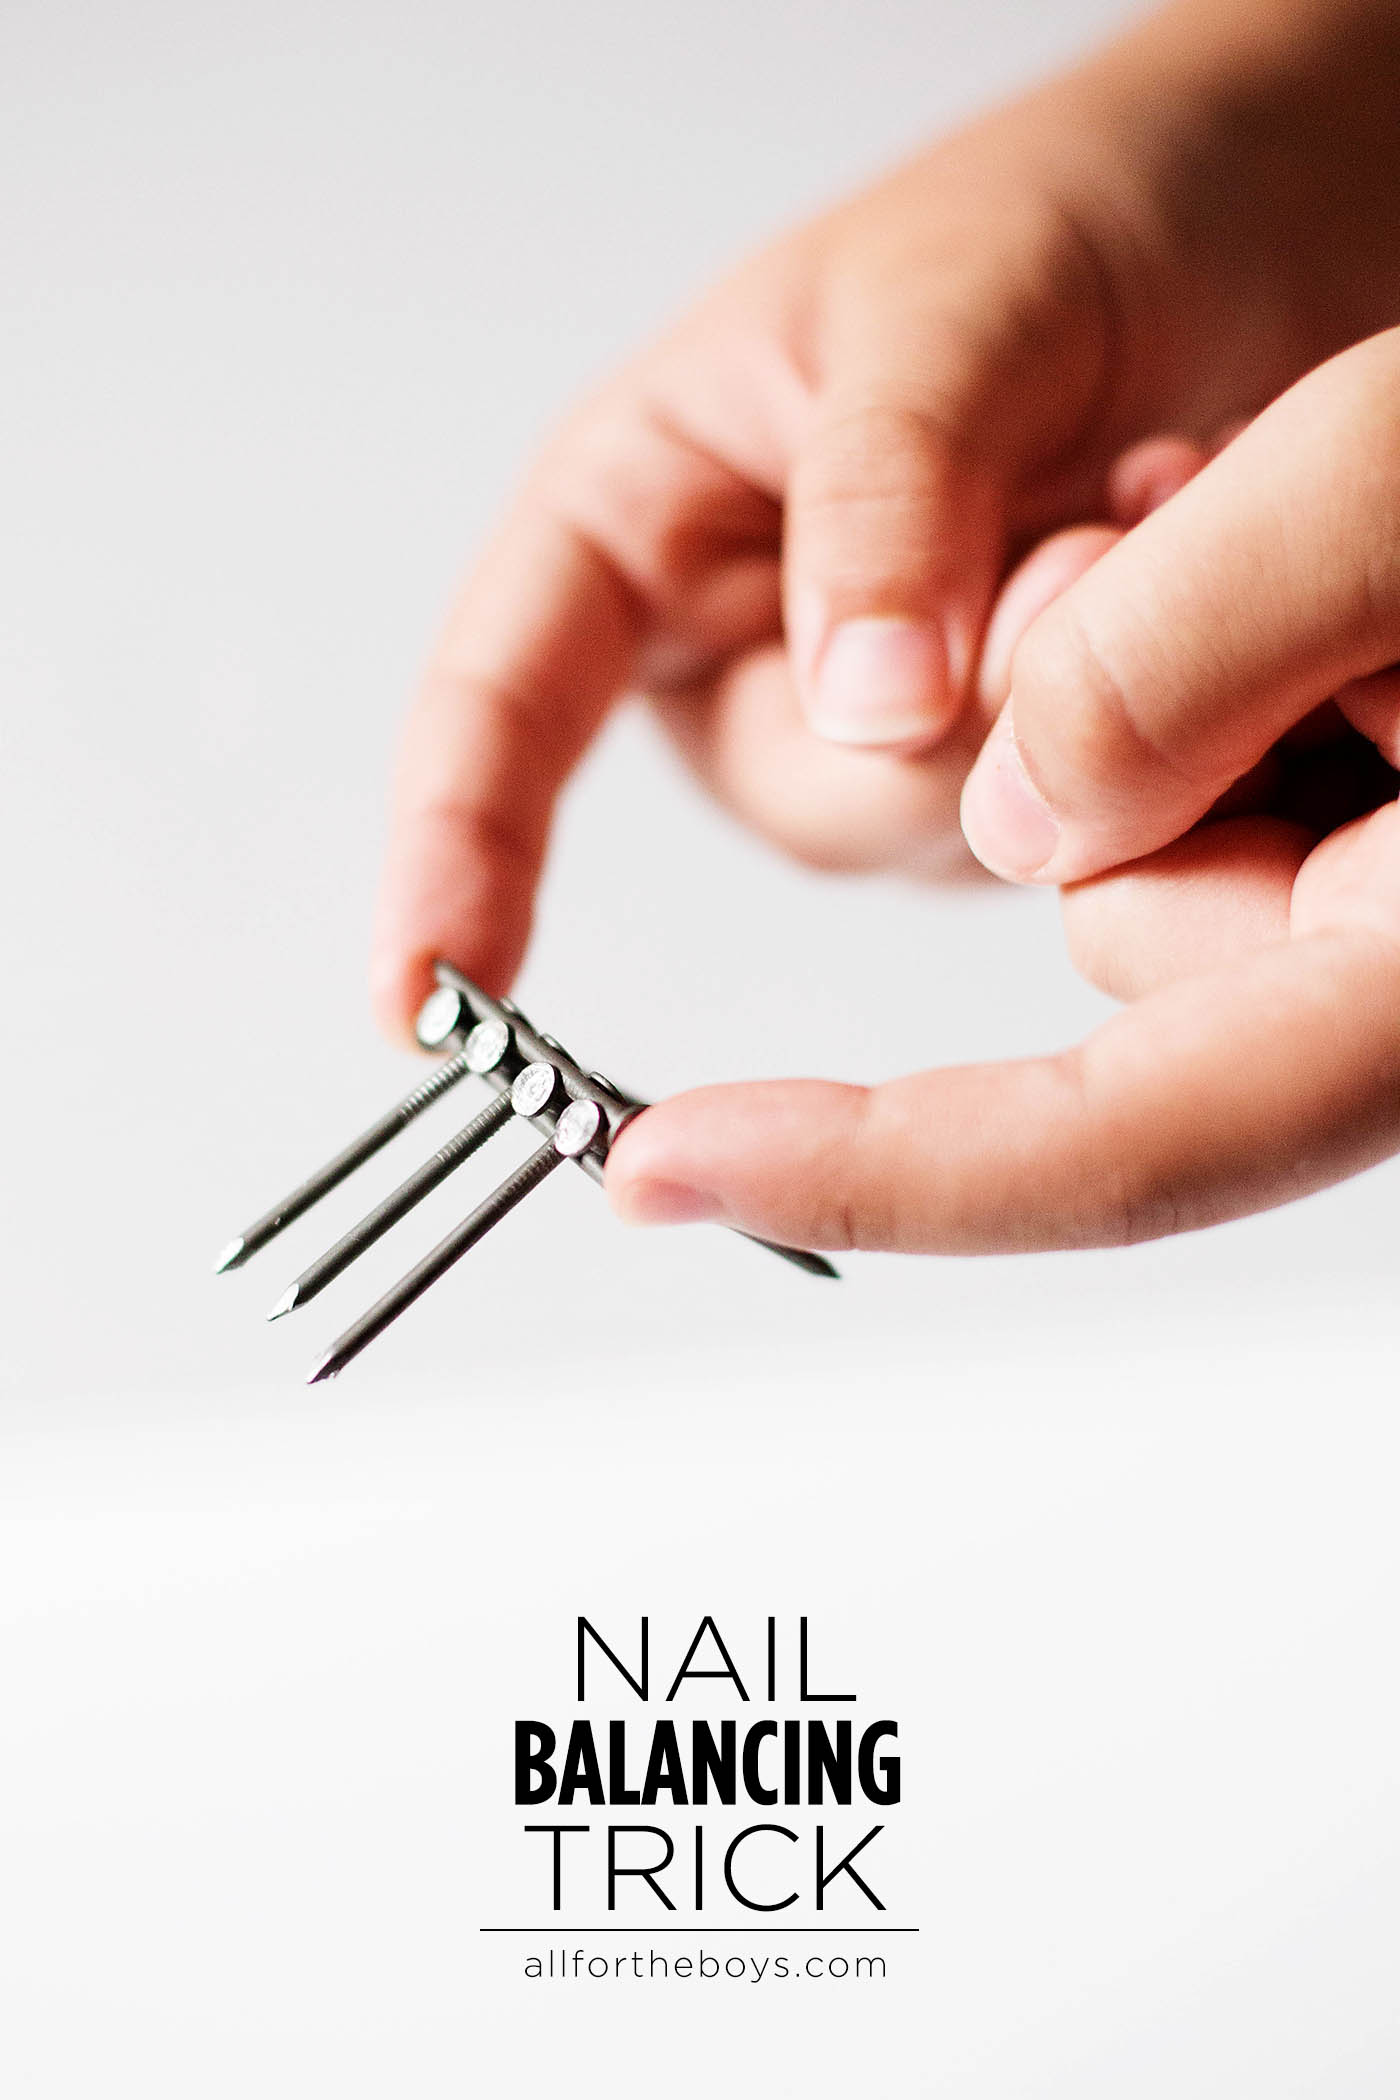 Nail balancing trick for kids